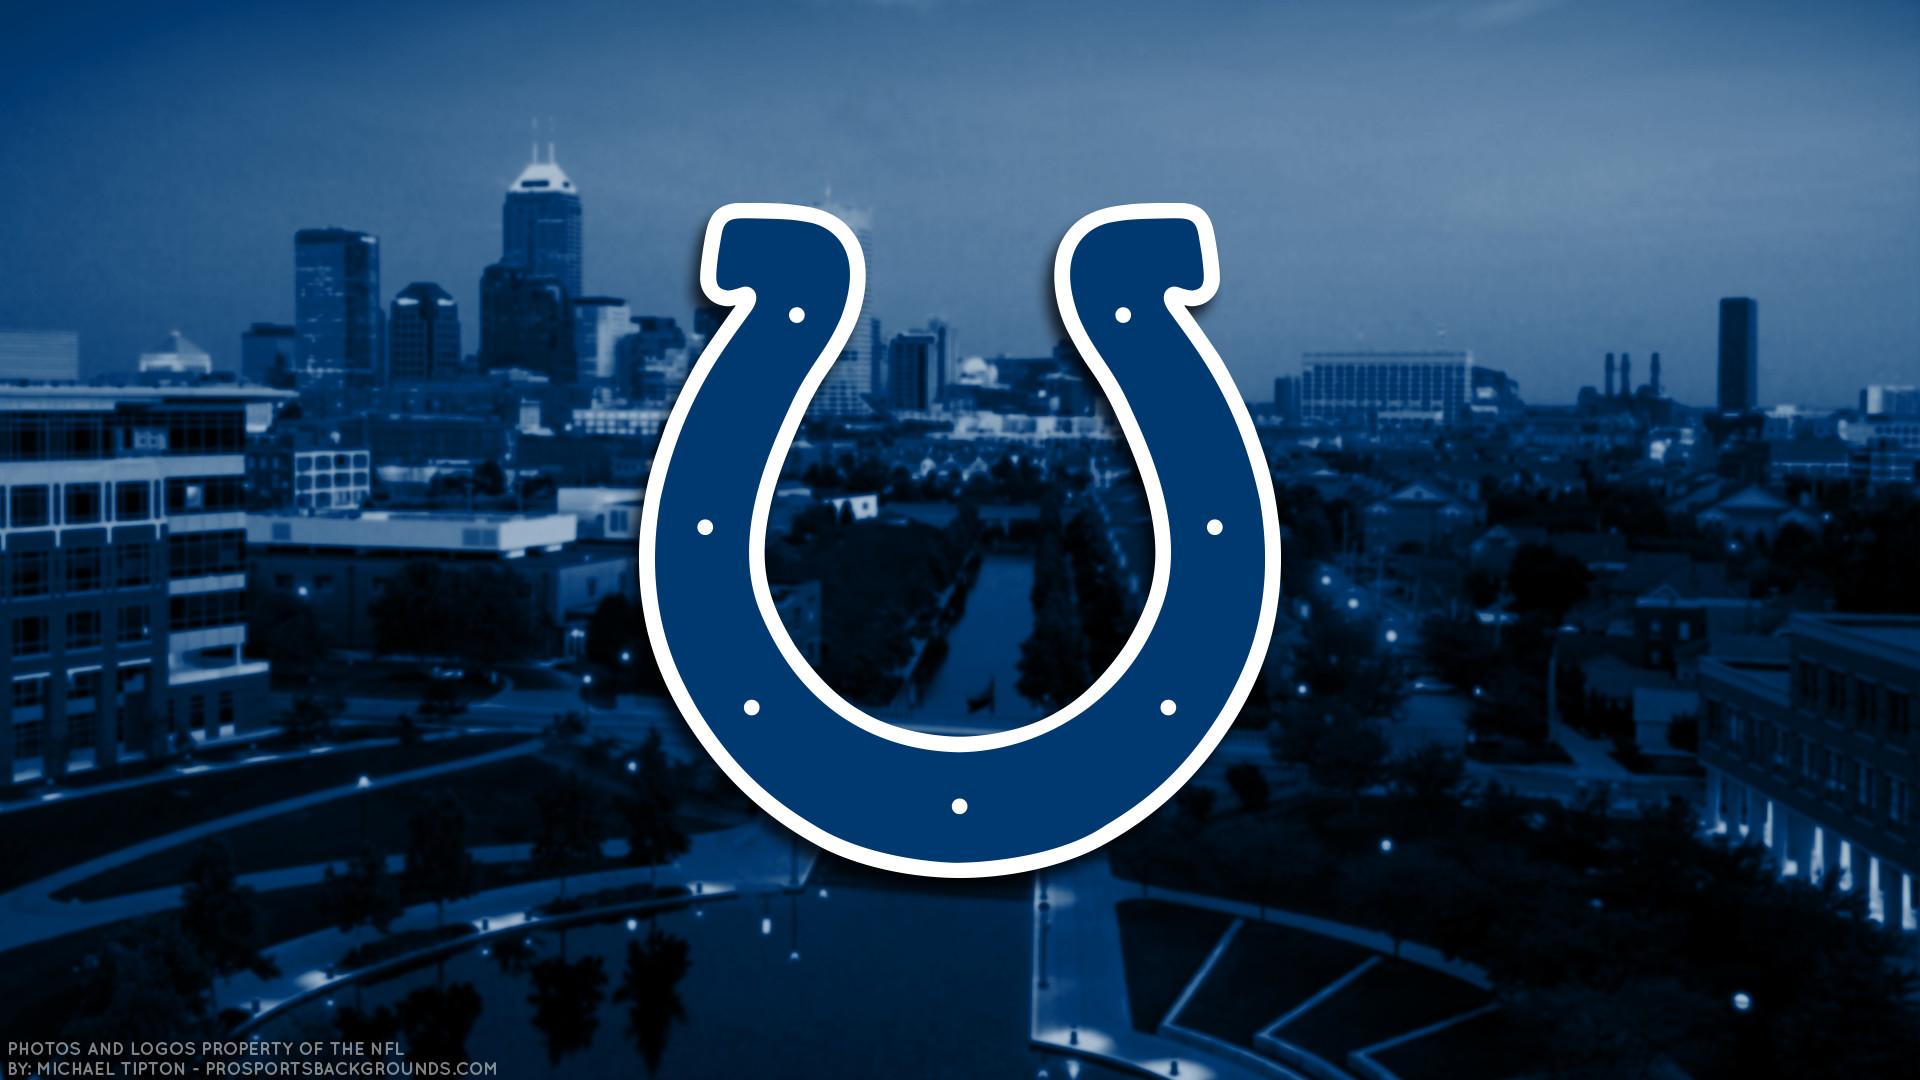 Indianapolis Colts Wallpaper 2017